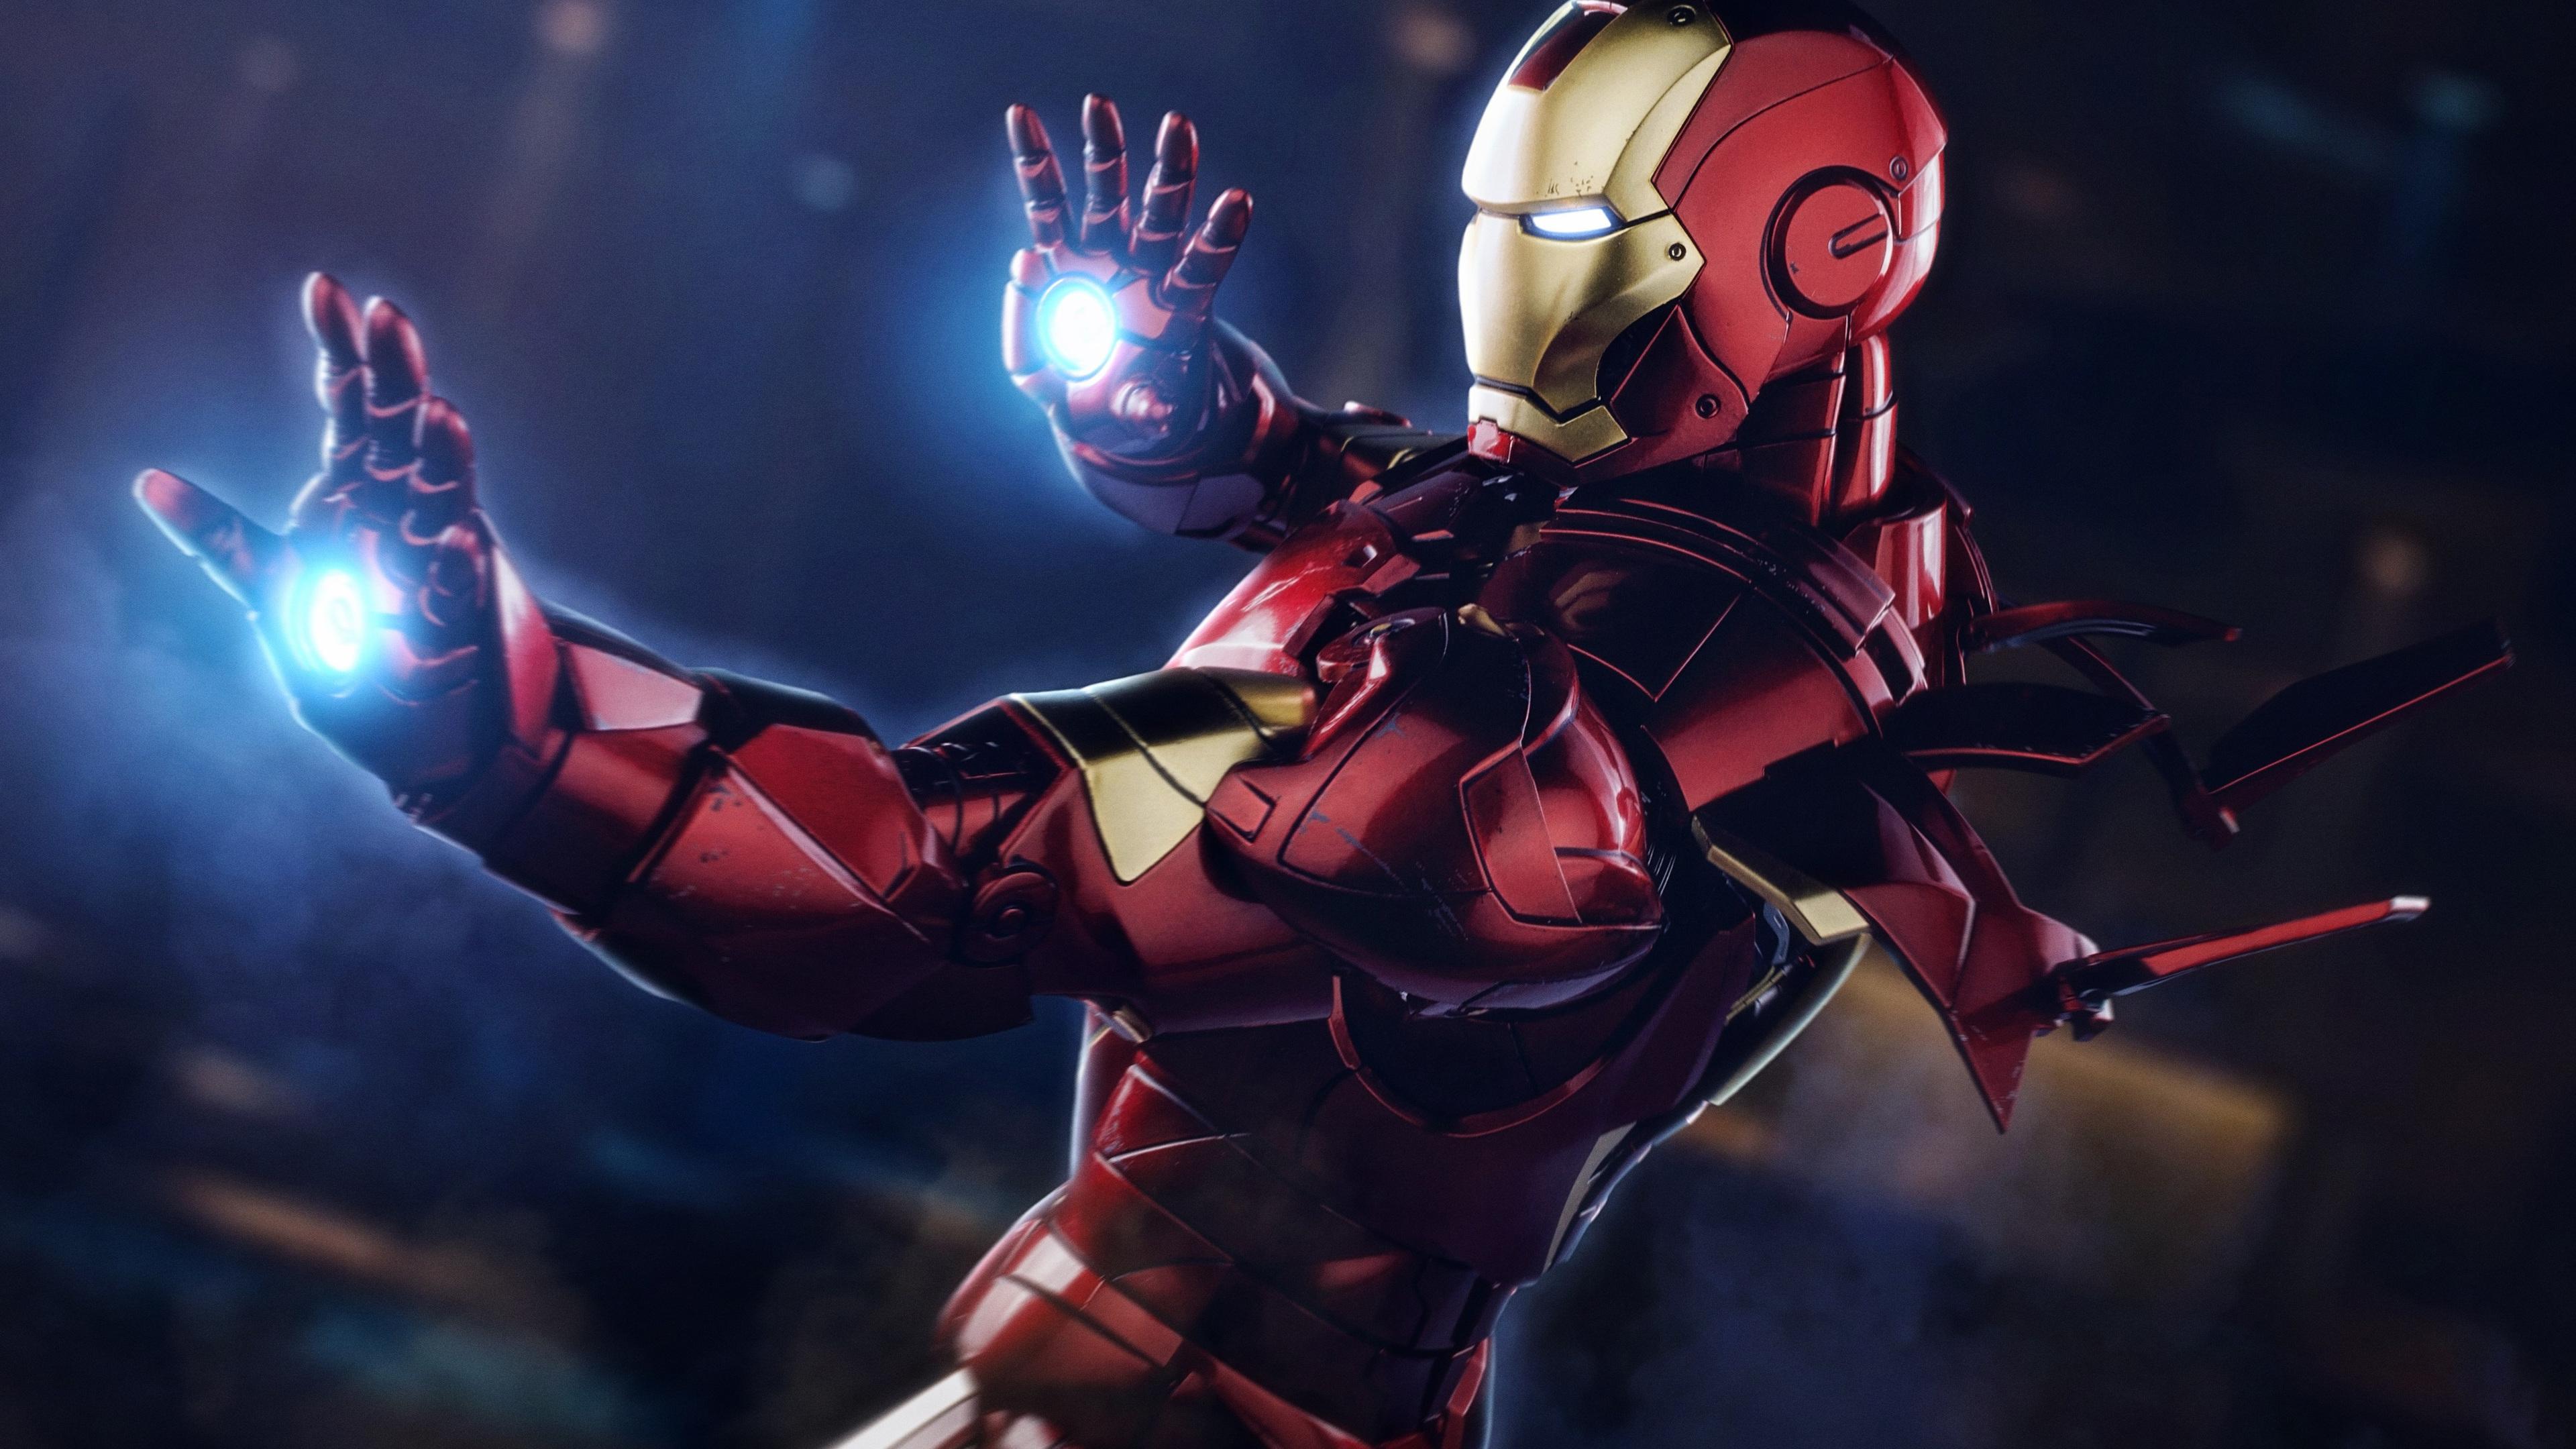 iron man 2018 5k 1537646040 - Iron Man 2018 5k - superheroes wallpapers, iron man wallpapers, hd-wallpapers, 5k wallpapers, 4k-wallpapers